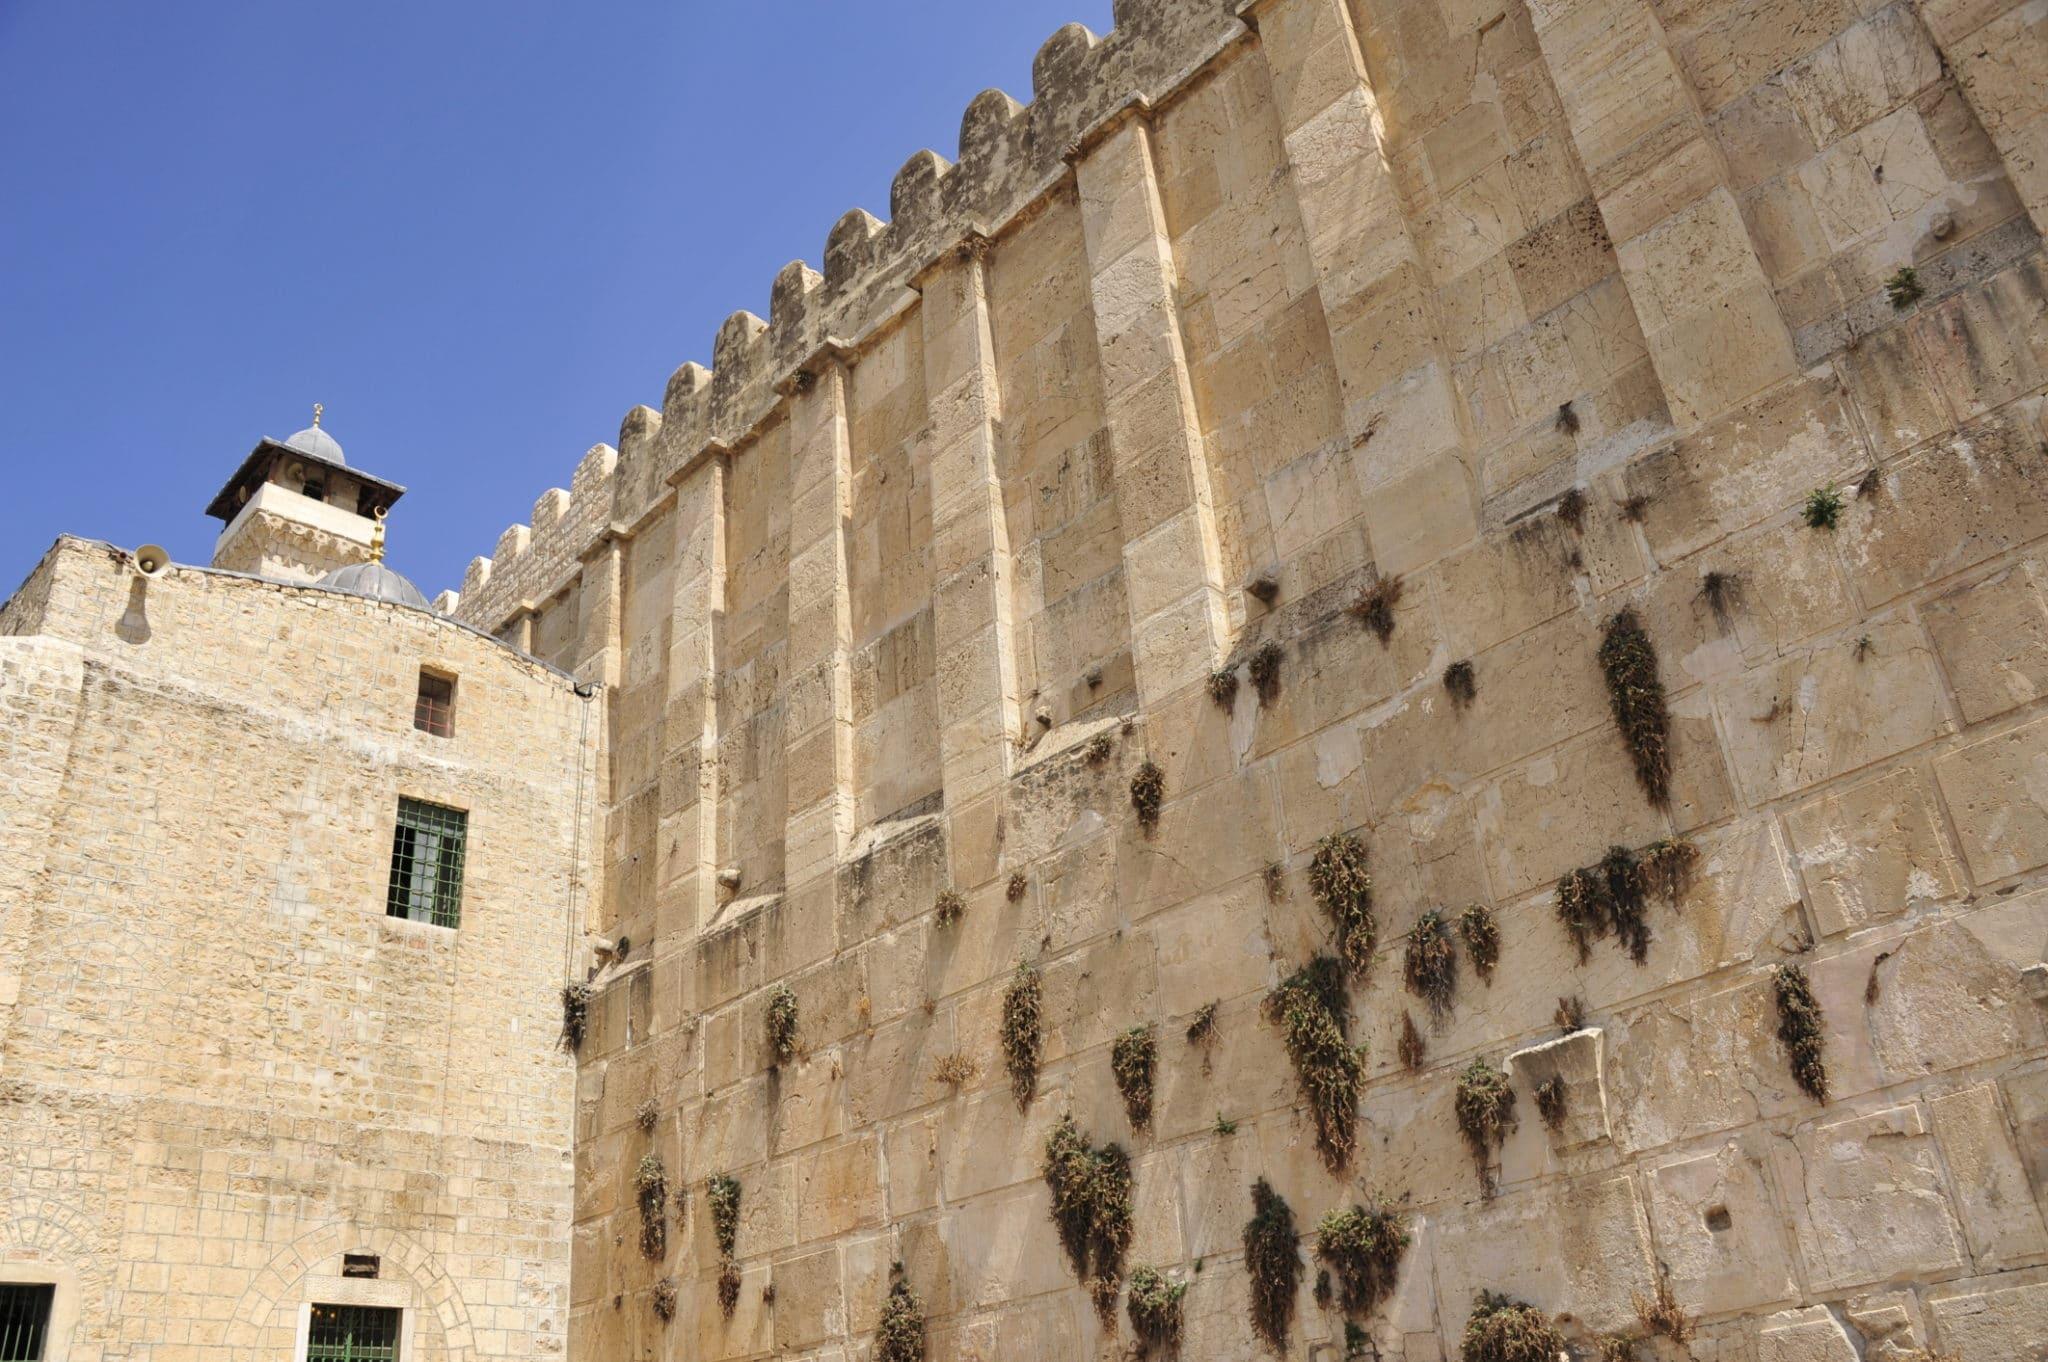 Hebron tomb of the patriarchs